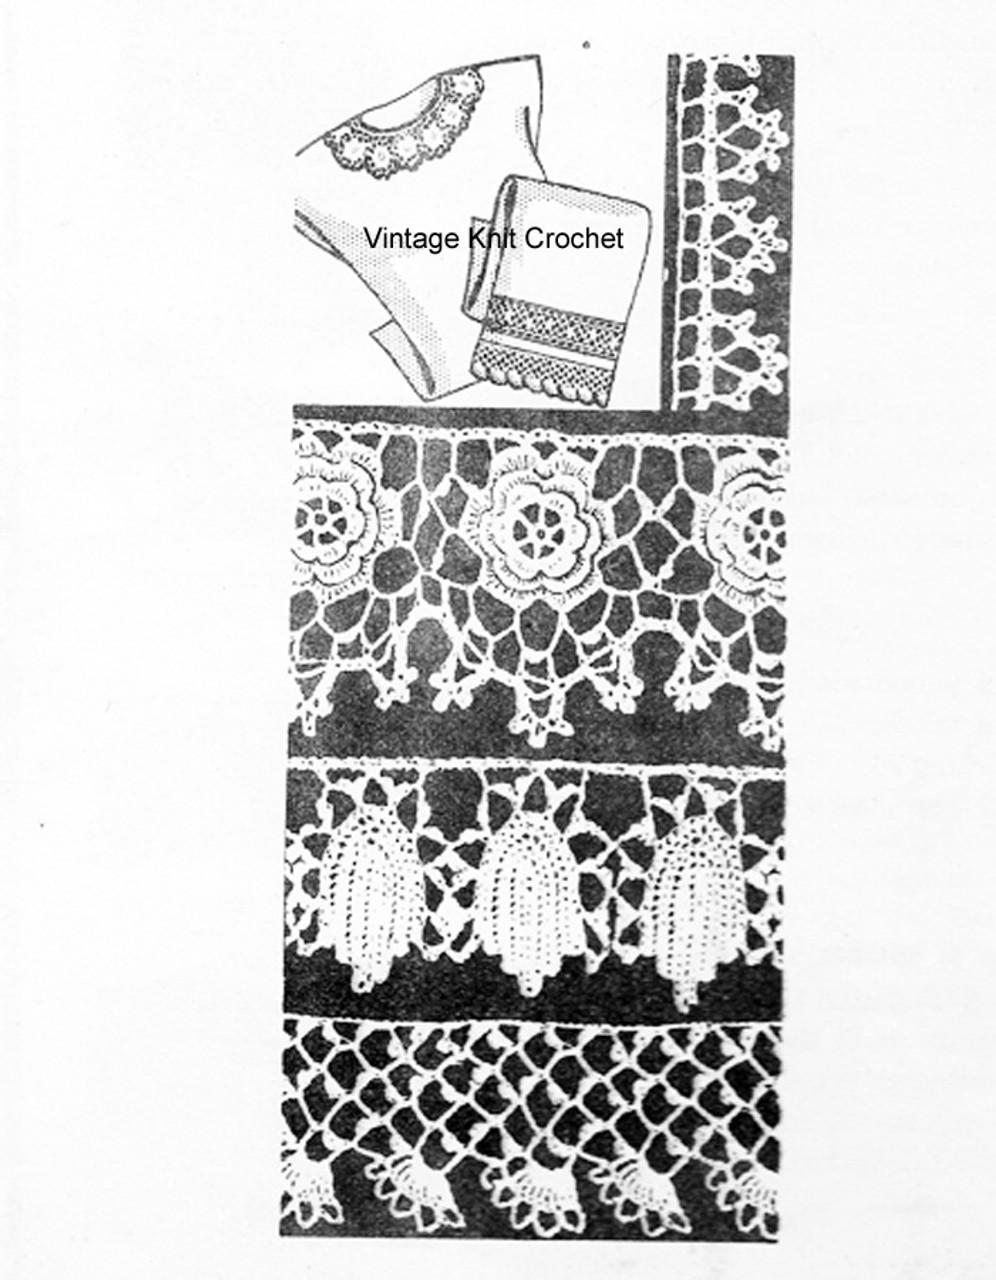 Vintage Irish Crochet Edgings Pattern, Design 7248